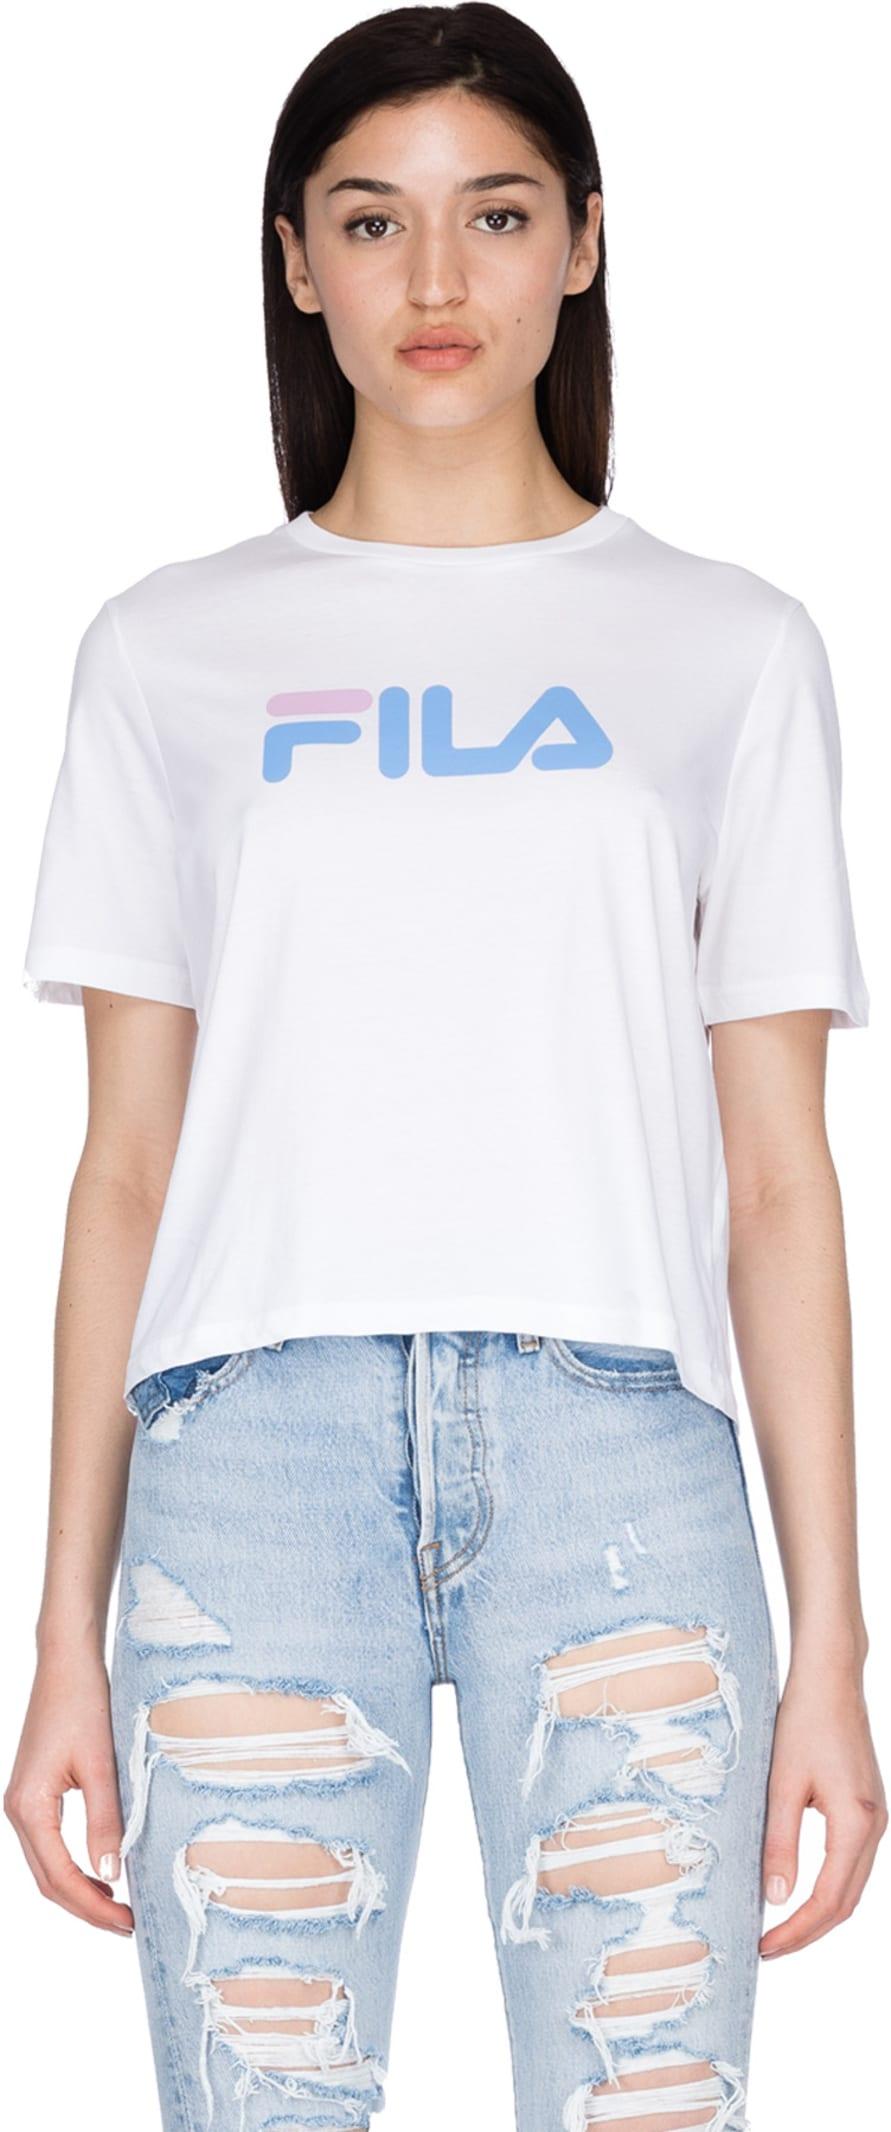 e288fb92a Blue T Shirt White Shorts